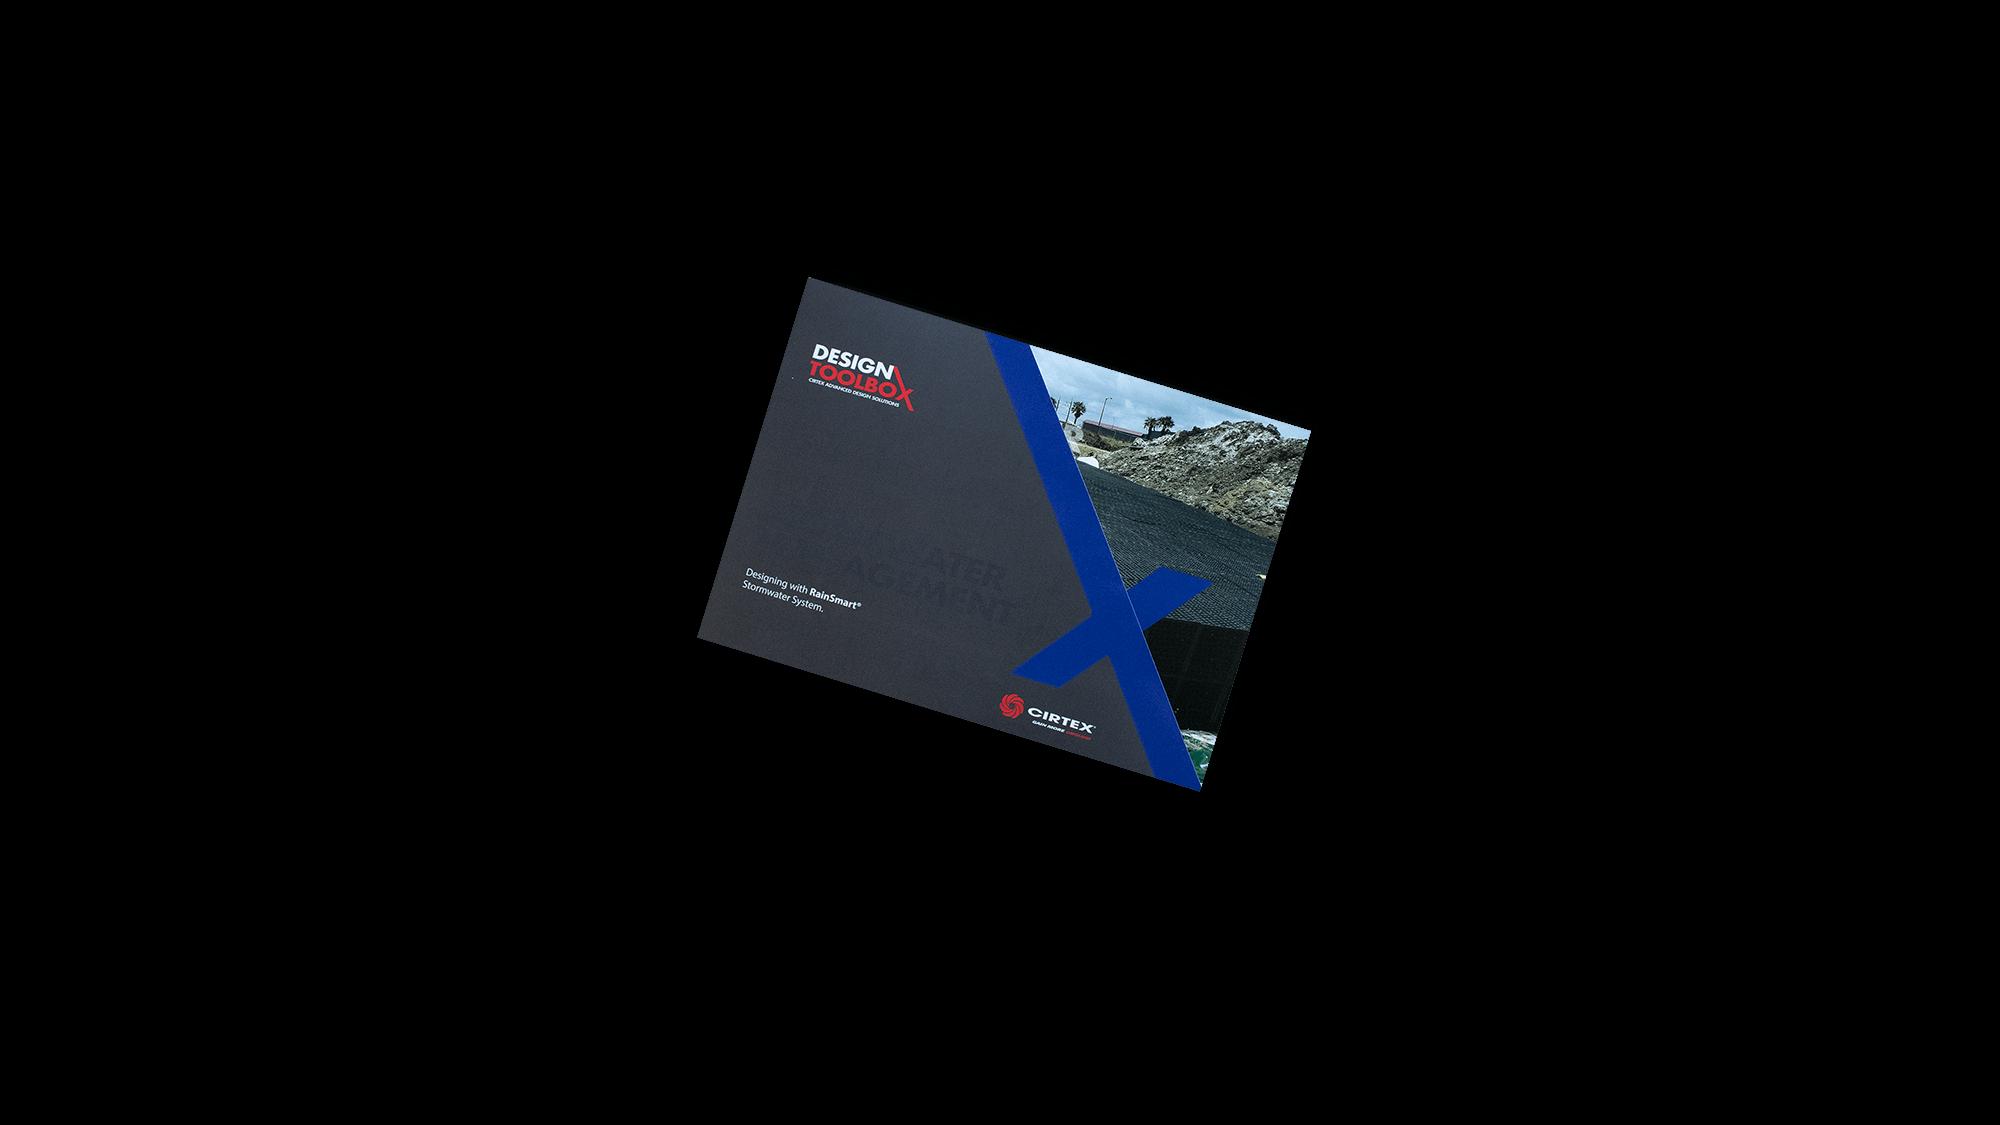 design-toolbox-rainsmart